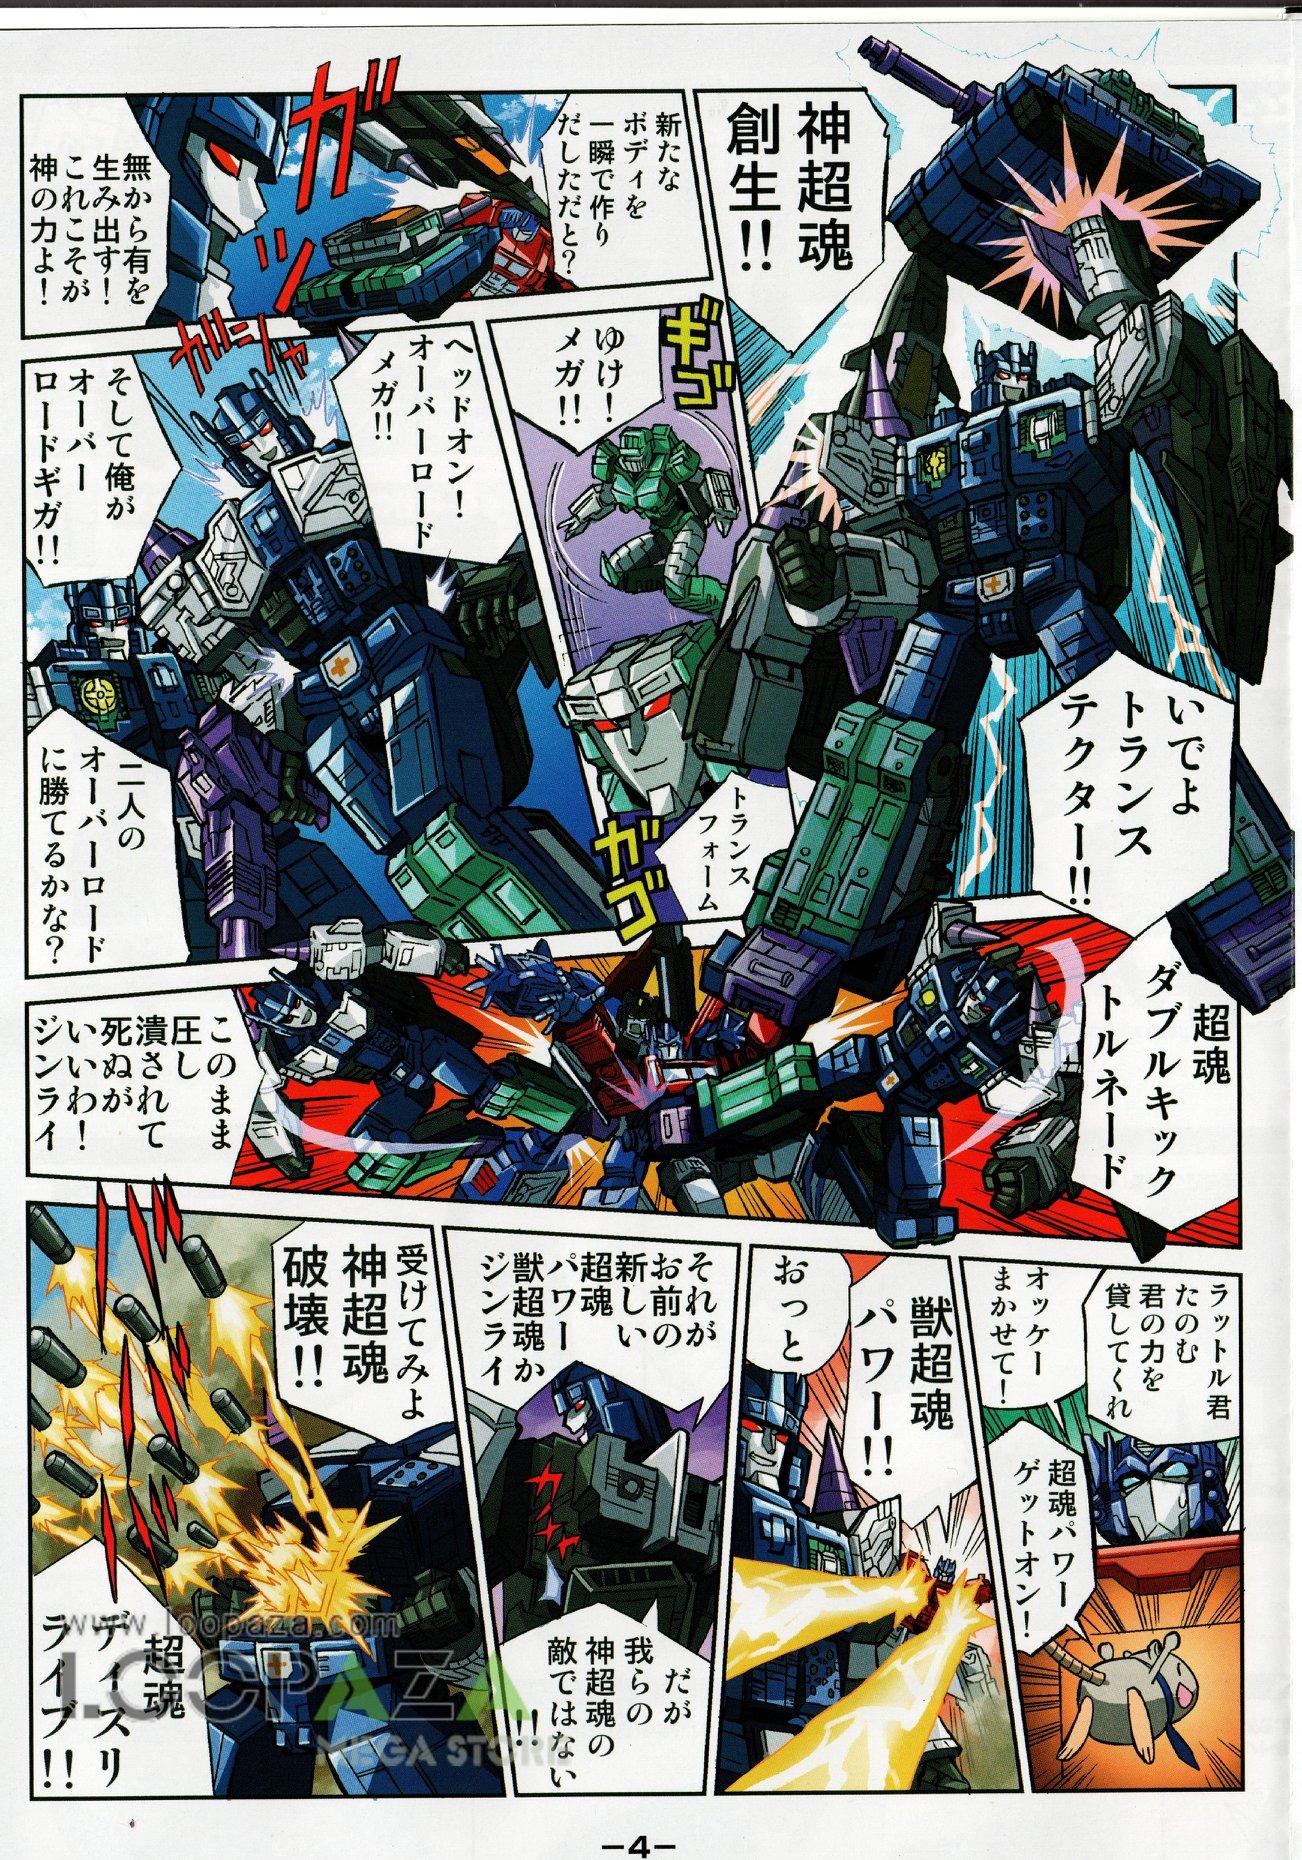 Takara Lg 60 Manga And Bio Card Scans New Overlord